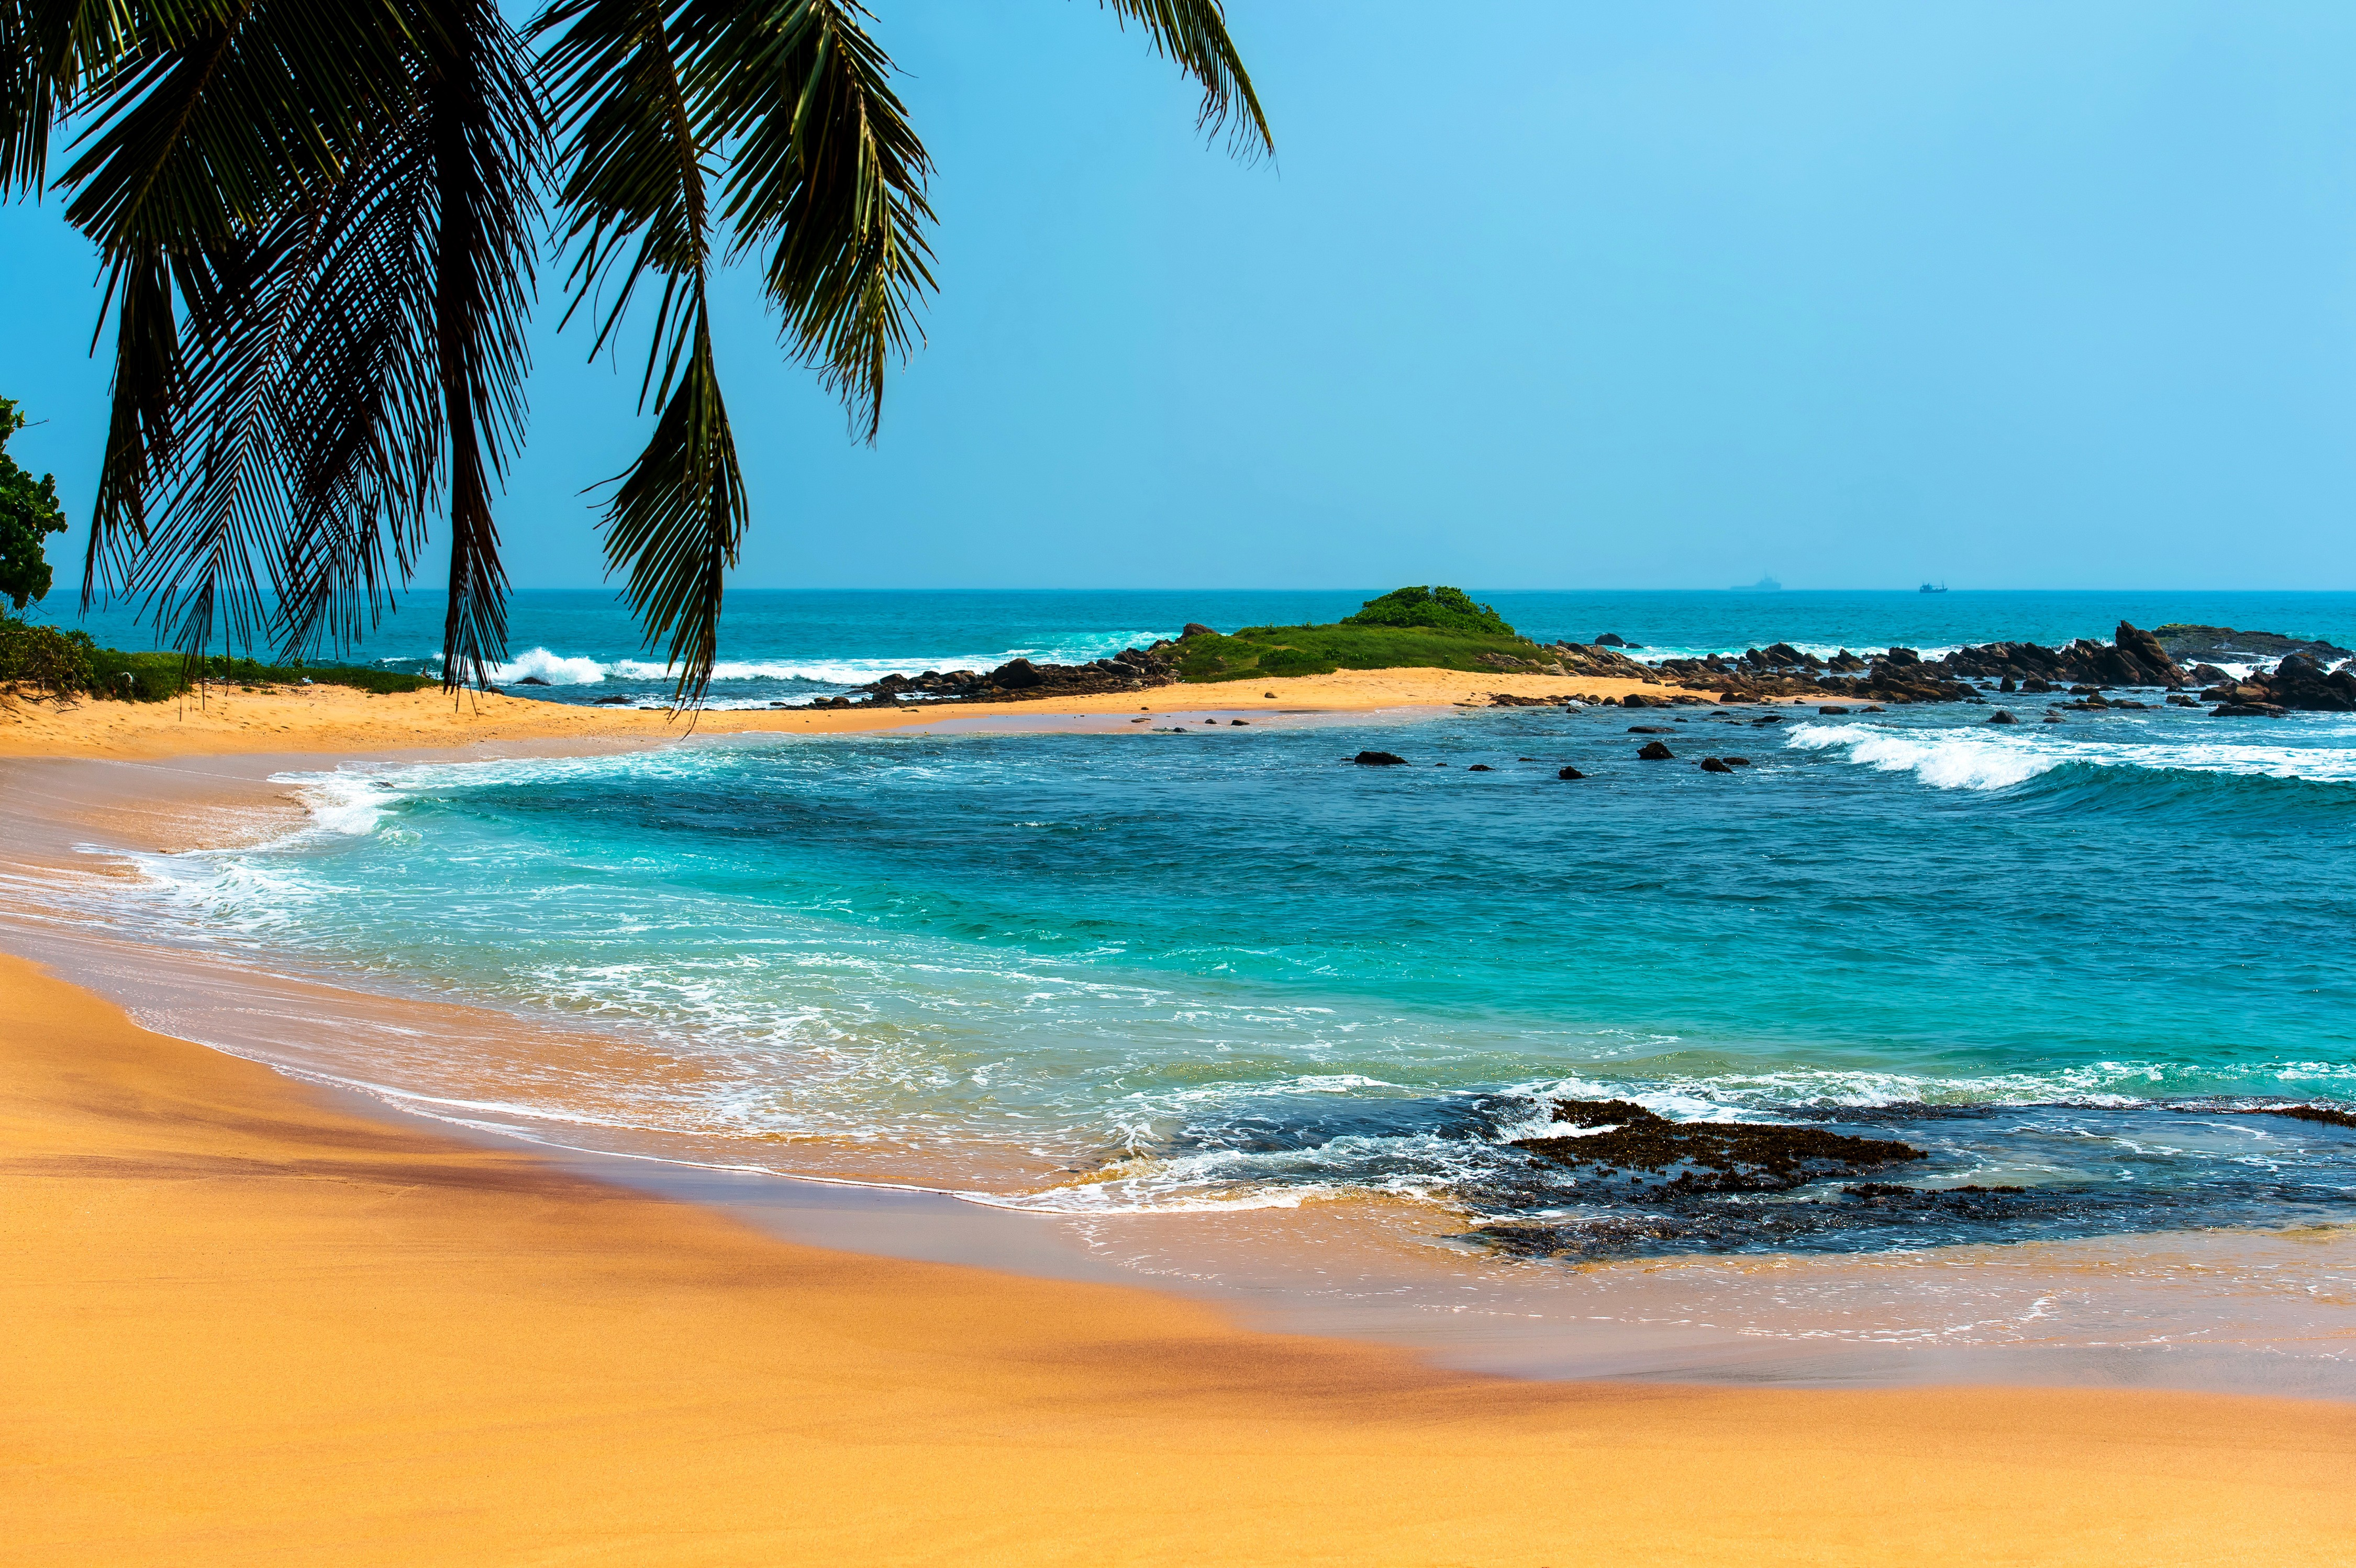 так, картинки красивого пляжа такого фонда